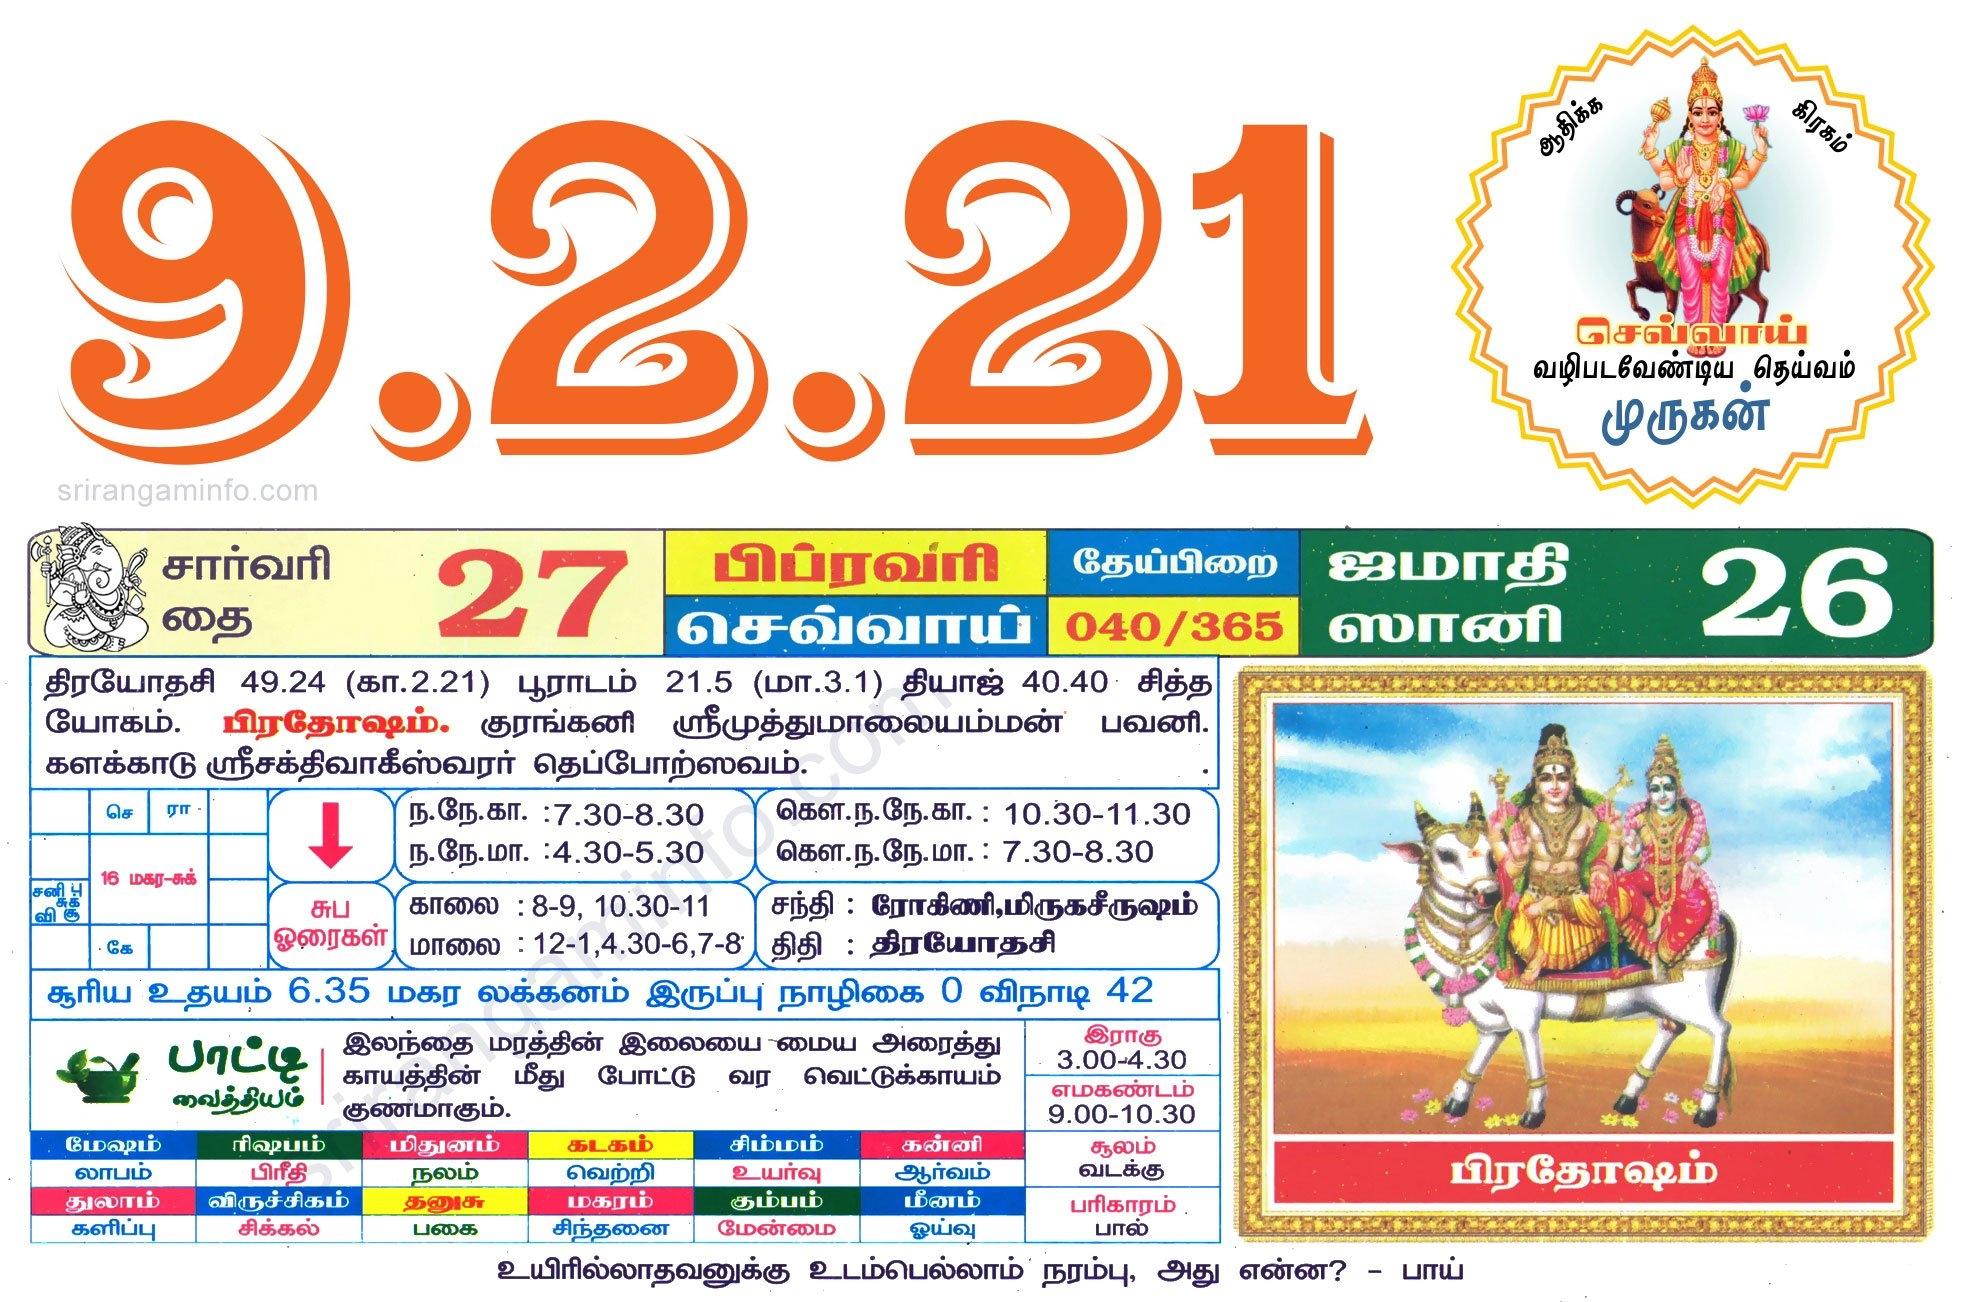 Tamil Daily Calendar 2021, Tamil Calendar 2021, Nalla Neram - தமிழ் தினசரி காலண்டர் within Tamil Calendar 2021 Photos